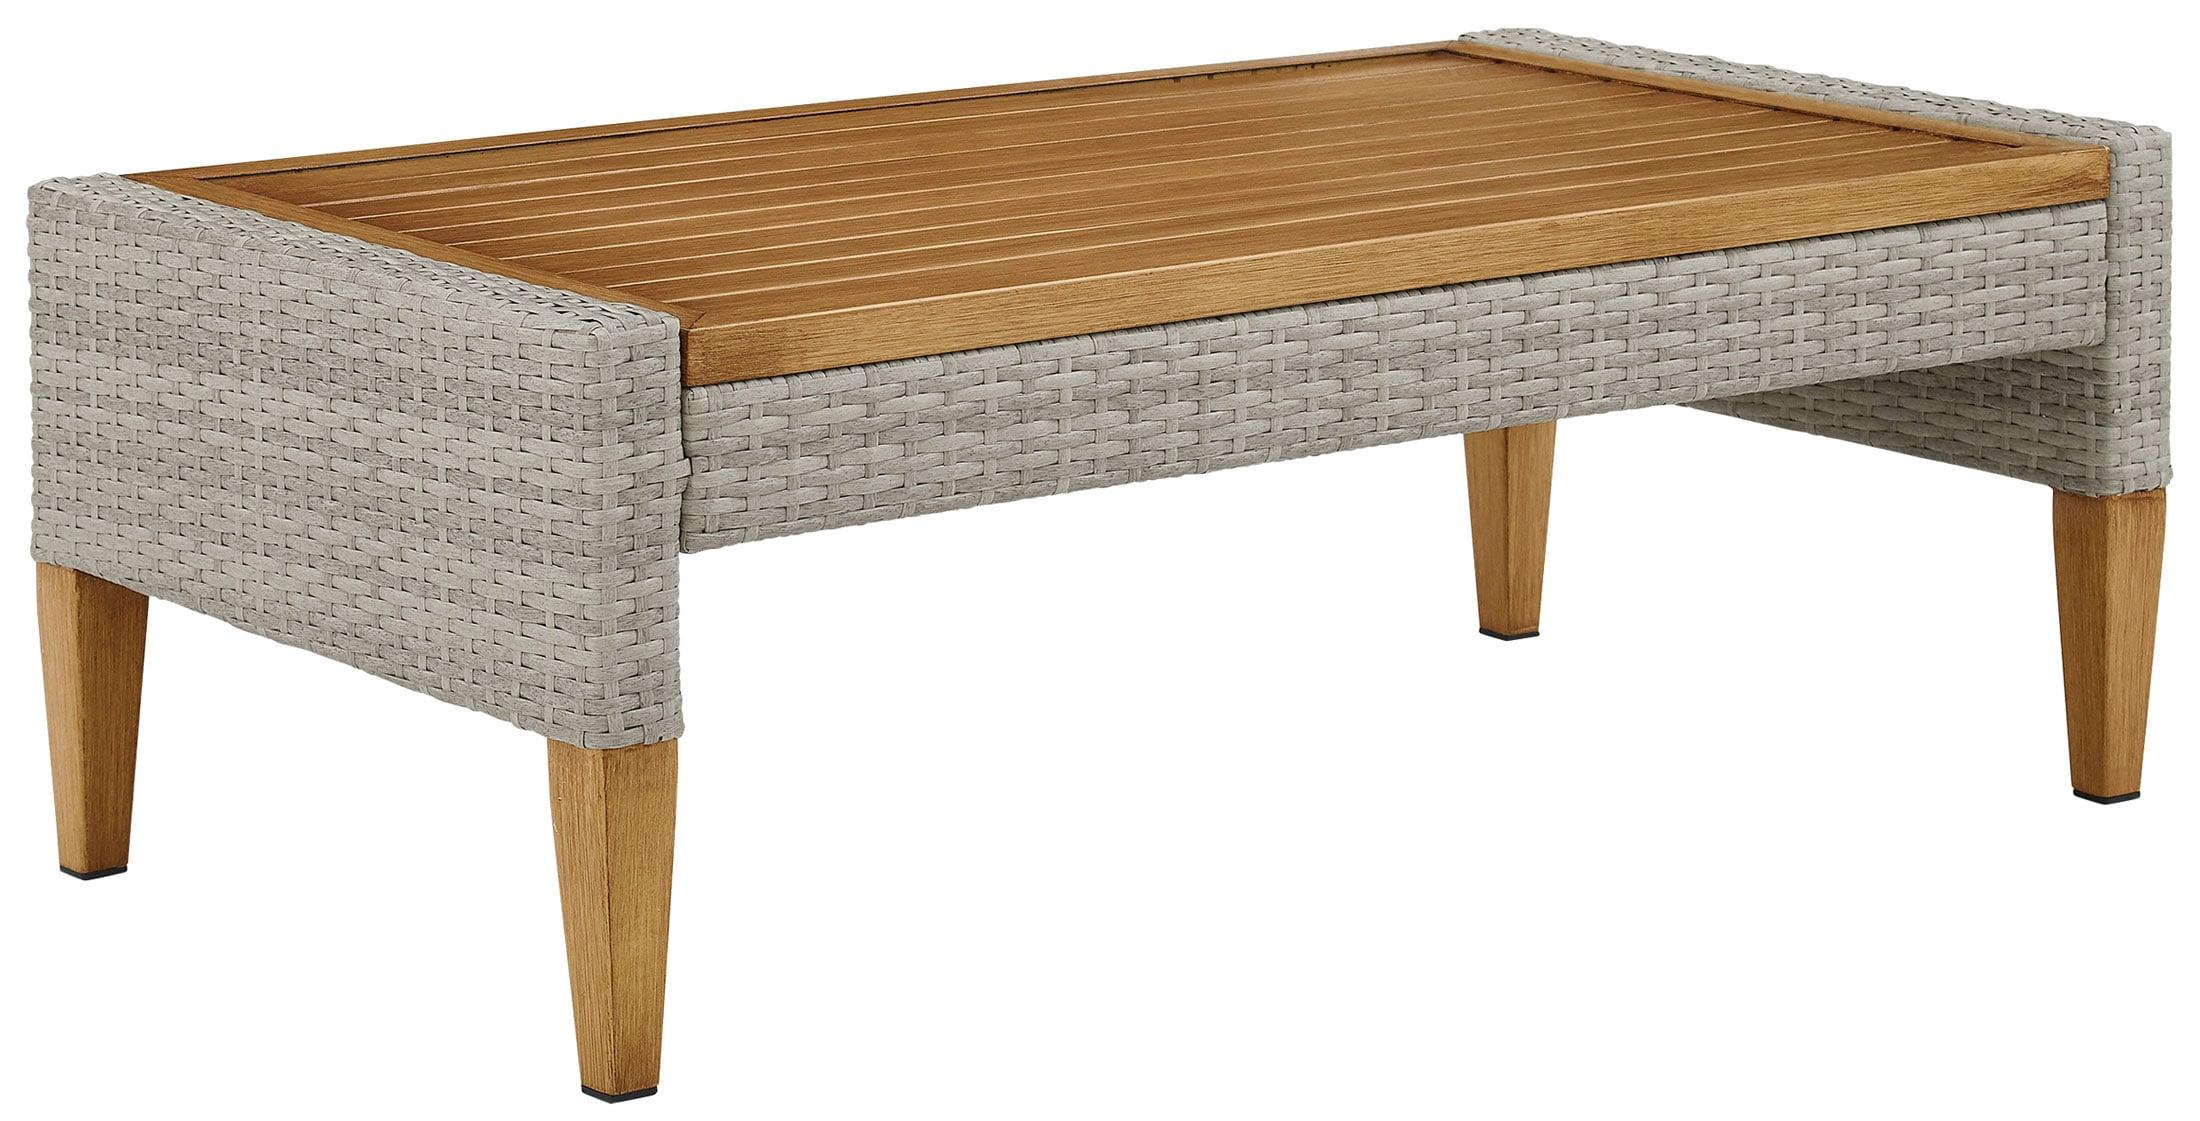 Outdoor Furniture - Capri Outdoor Coffee Table